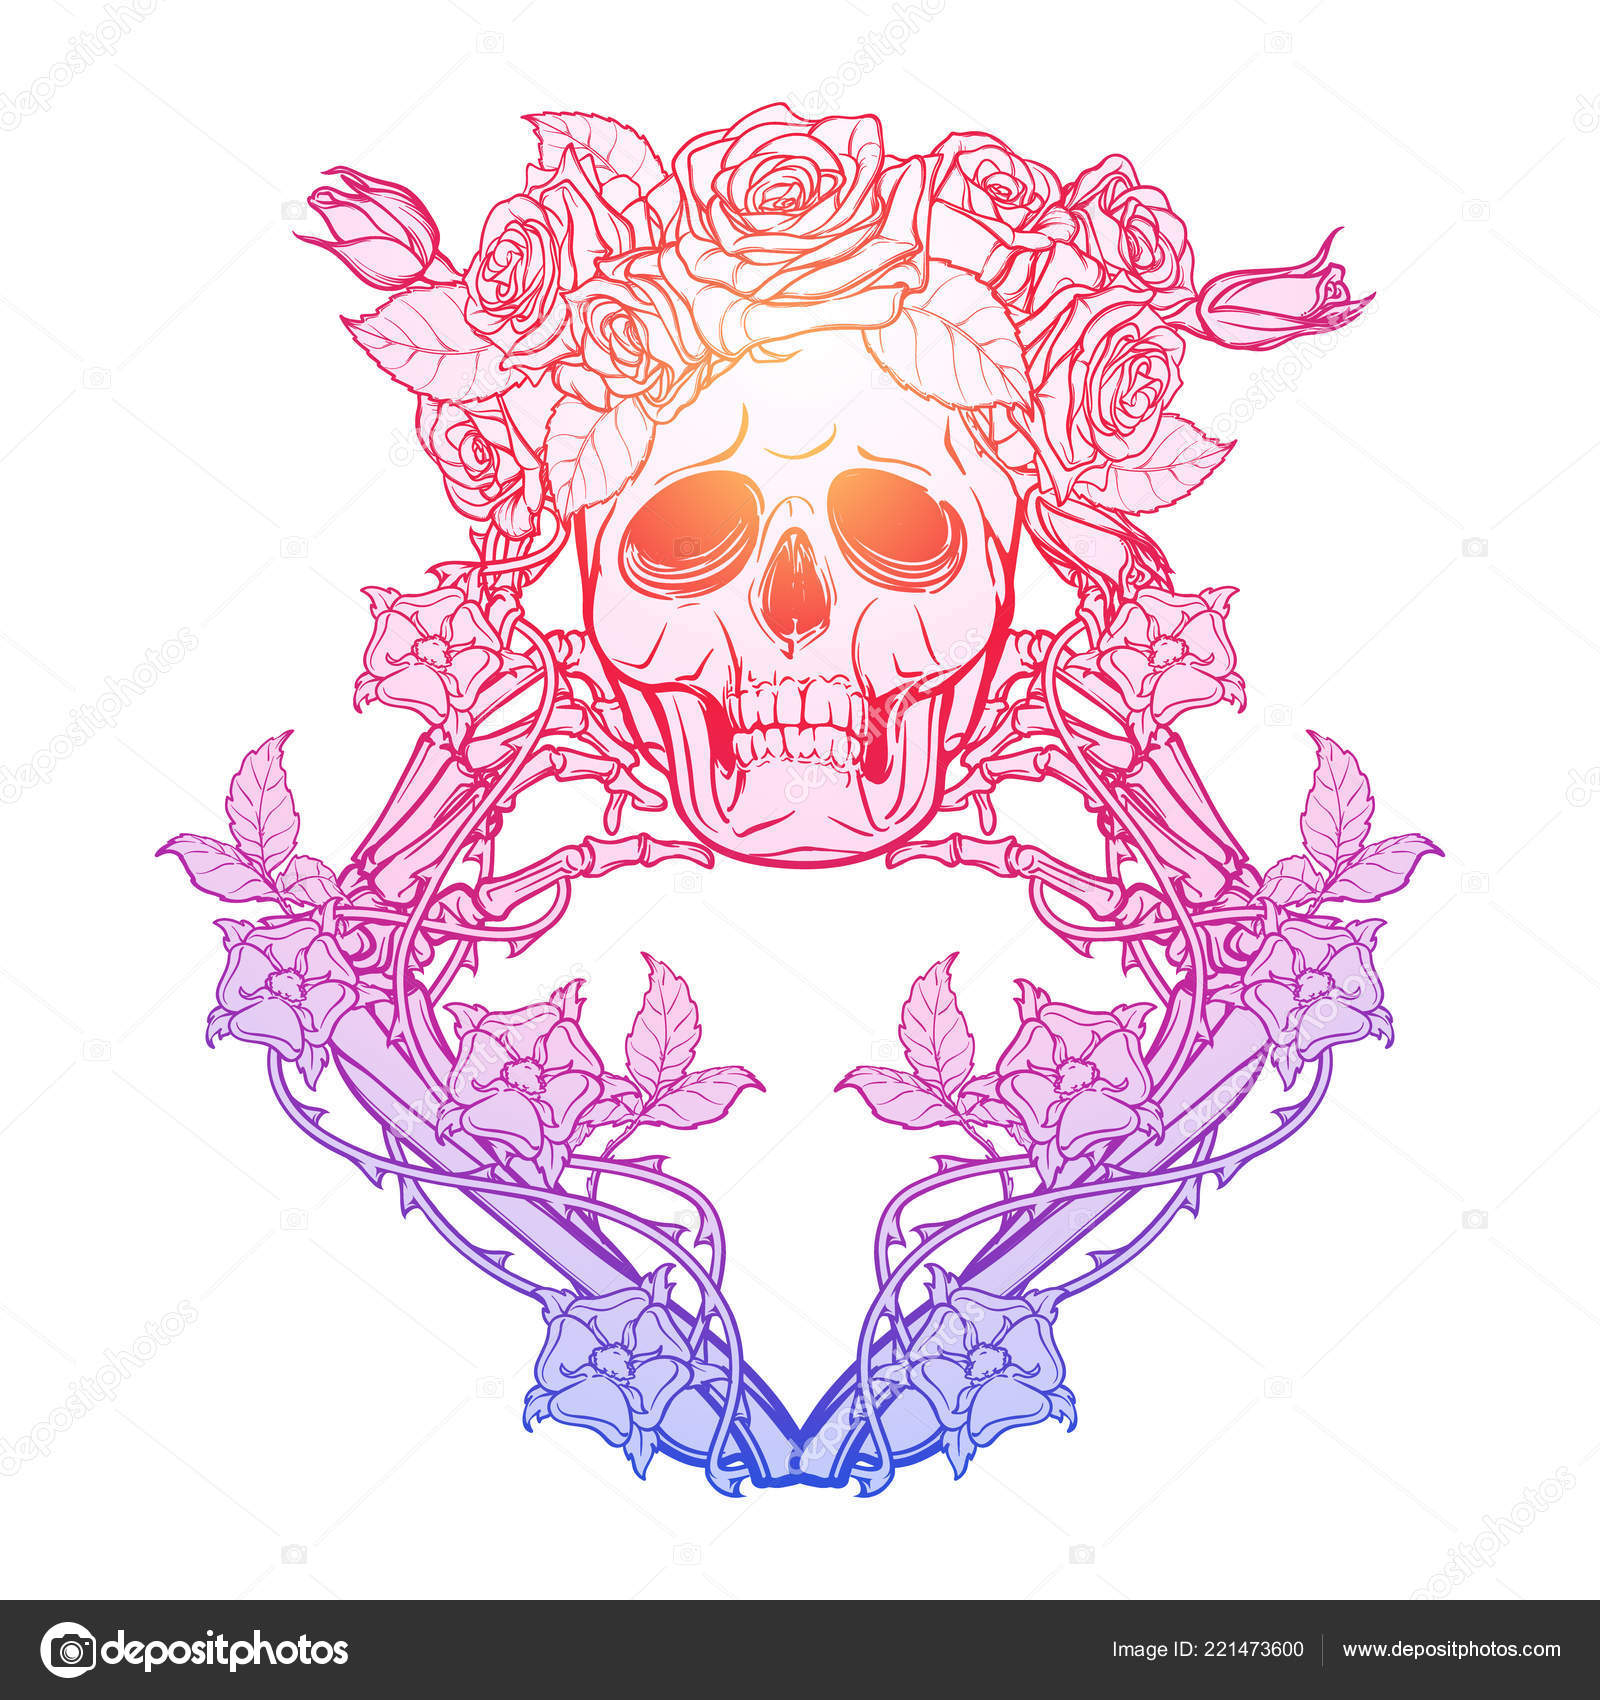 Halloween Santa Muerte Cranio Umano Rosa Ossa Mano Corona Ghirlande